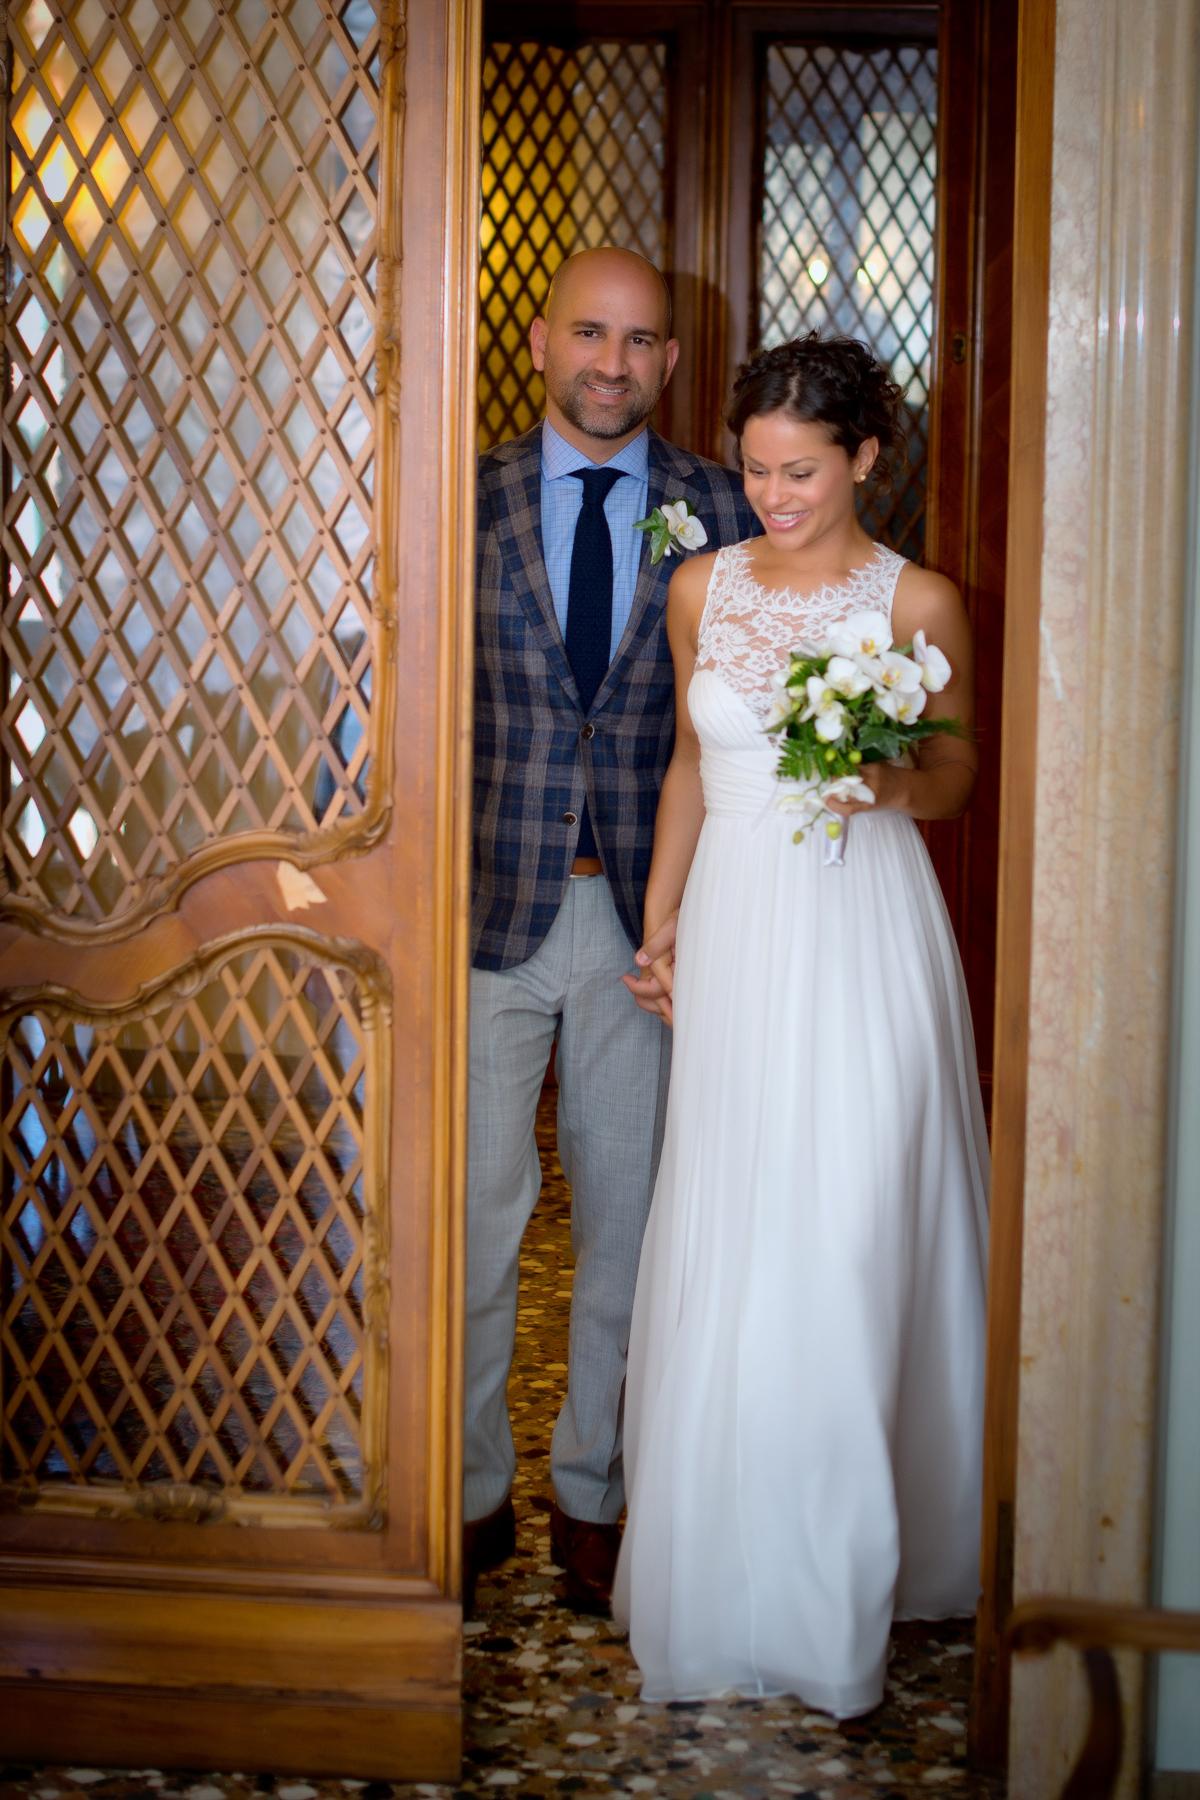 mariage venise photographe palazzo cavalli venice wedding photographer (46).jpg